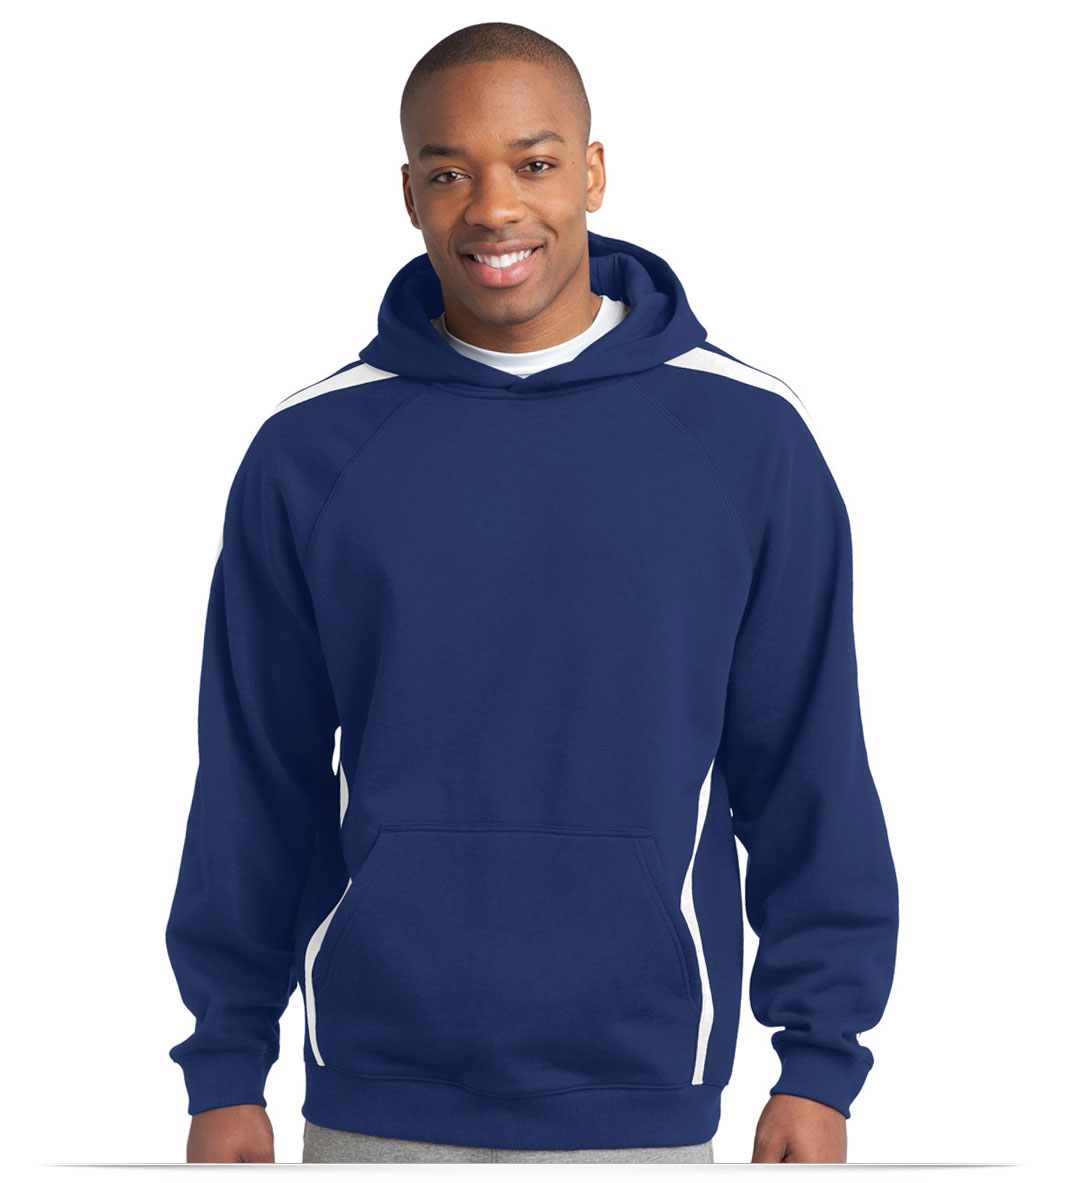 Custom Sport-Tek Sleeve Stripe Hooded Sweatshirt